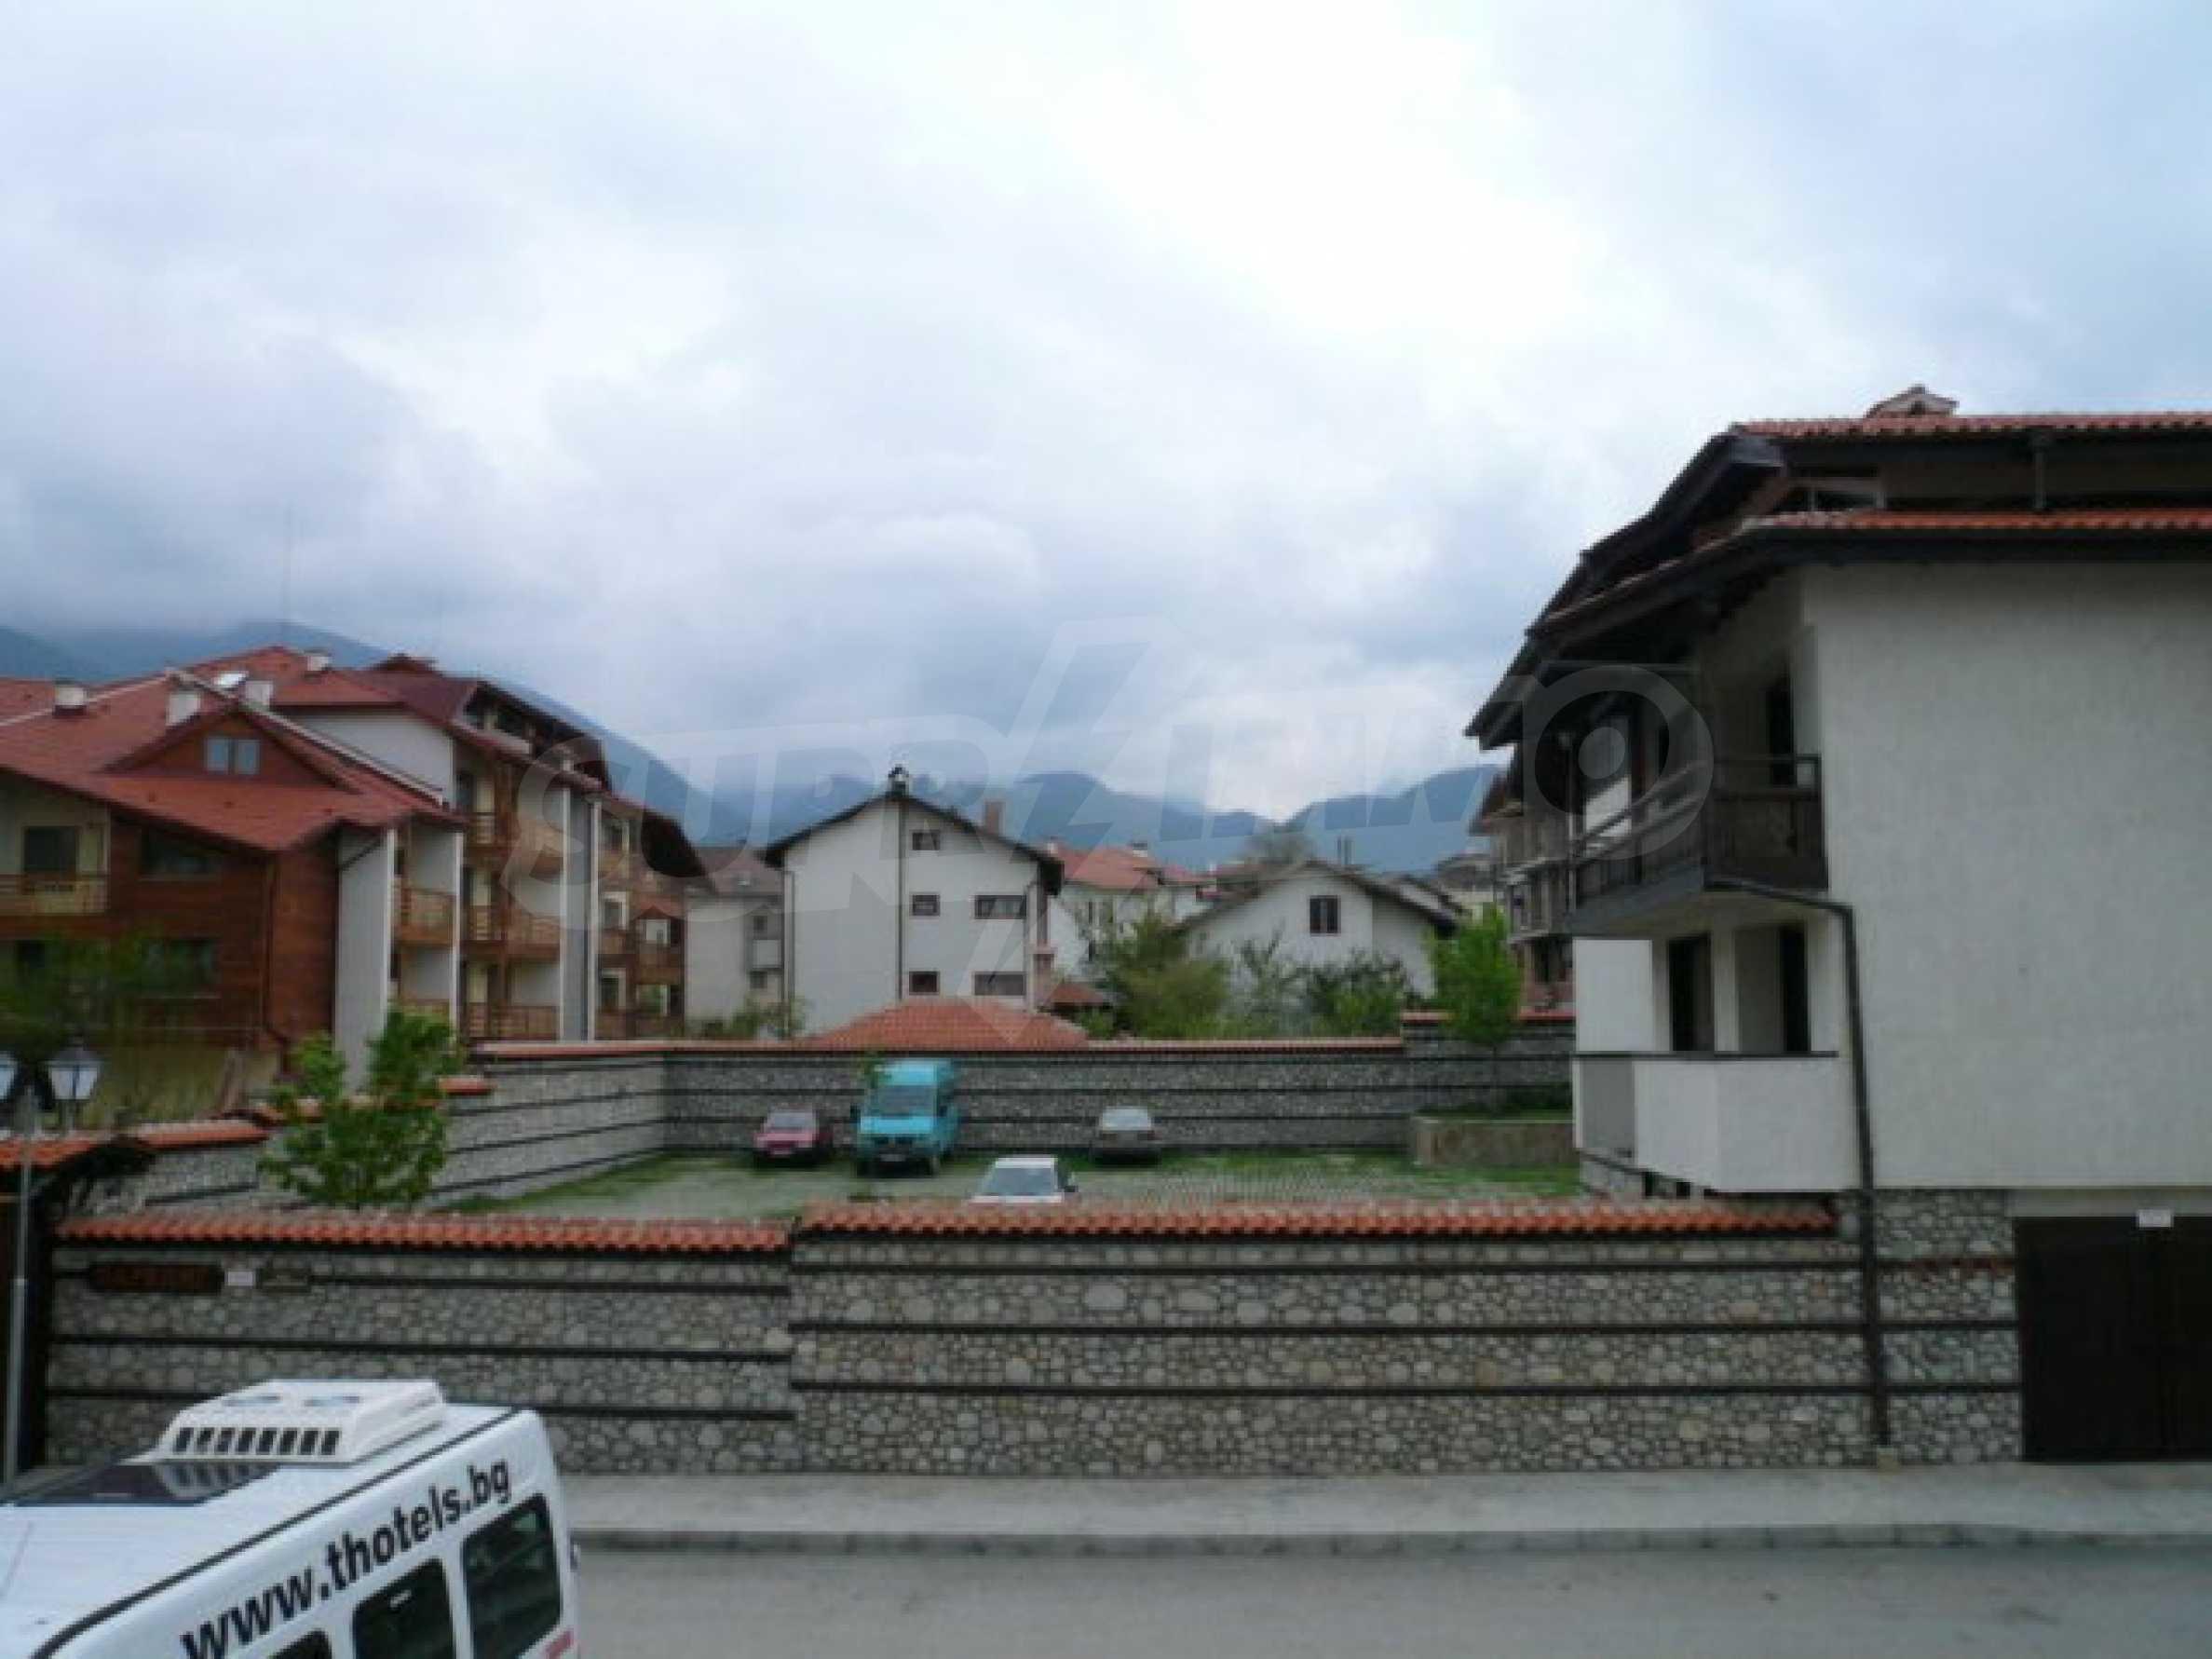 Двустаен апартамент за продажба в гр. Банско 11